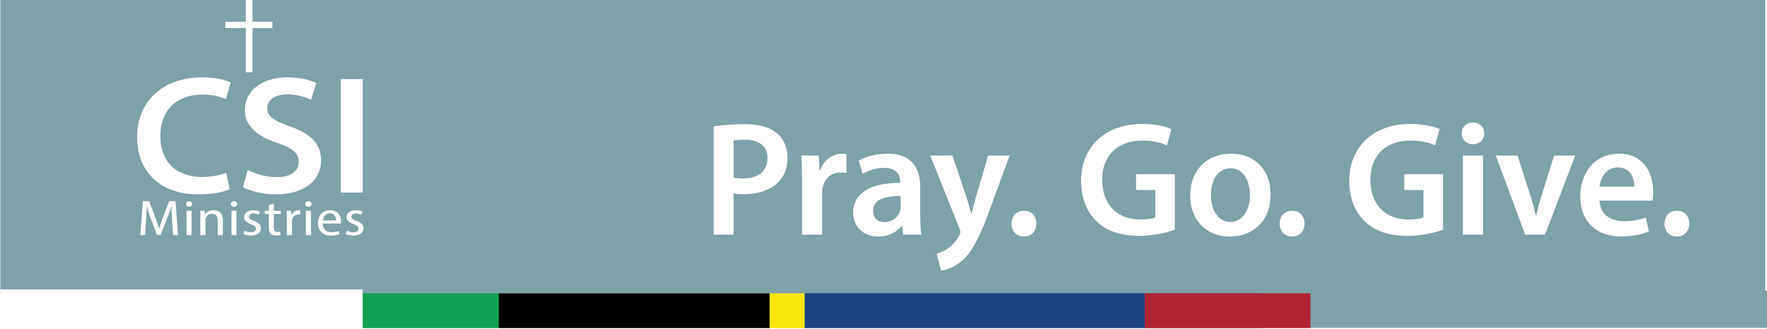 Pray. Go. Give. image